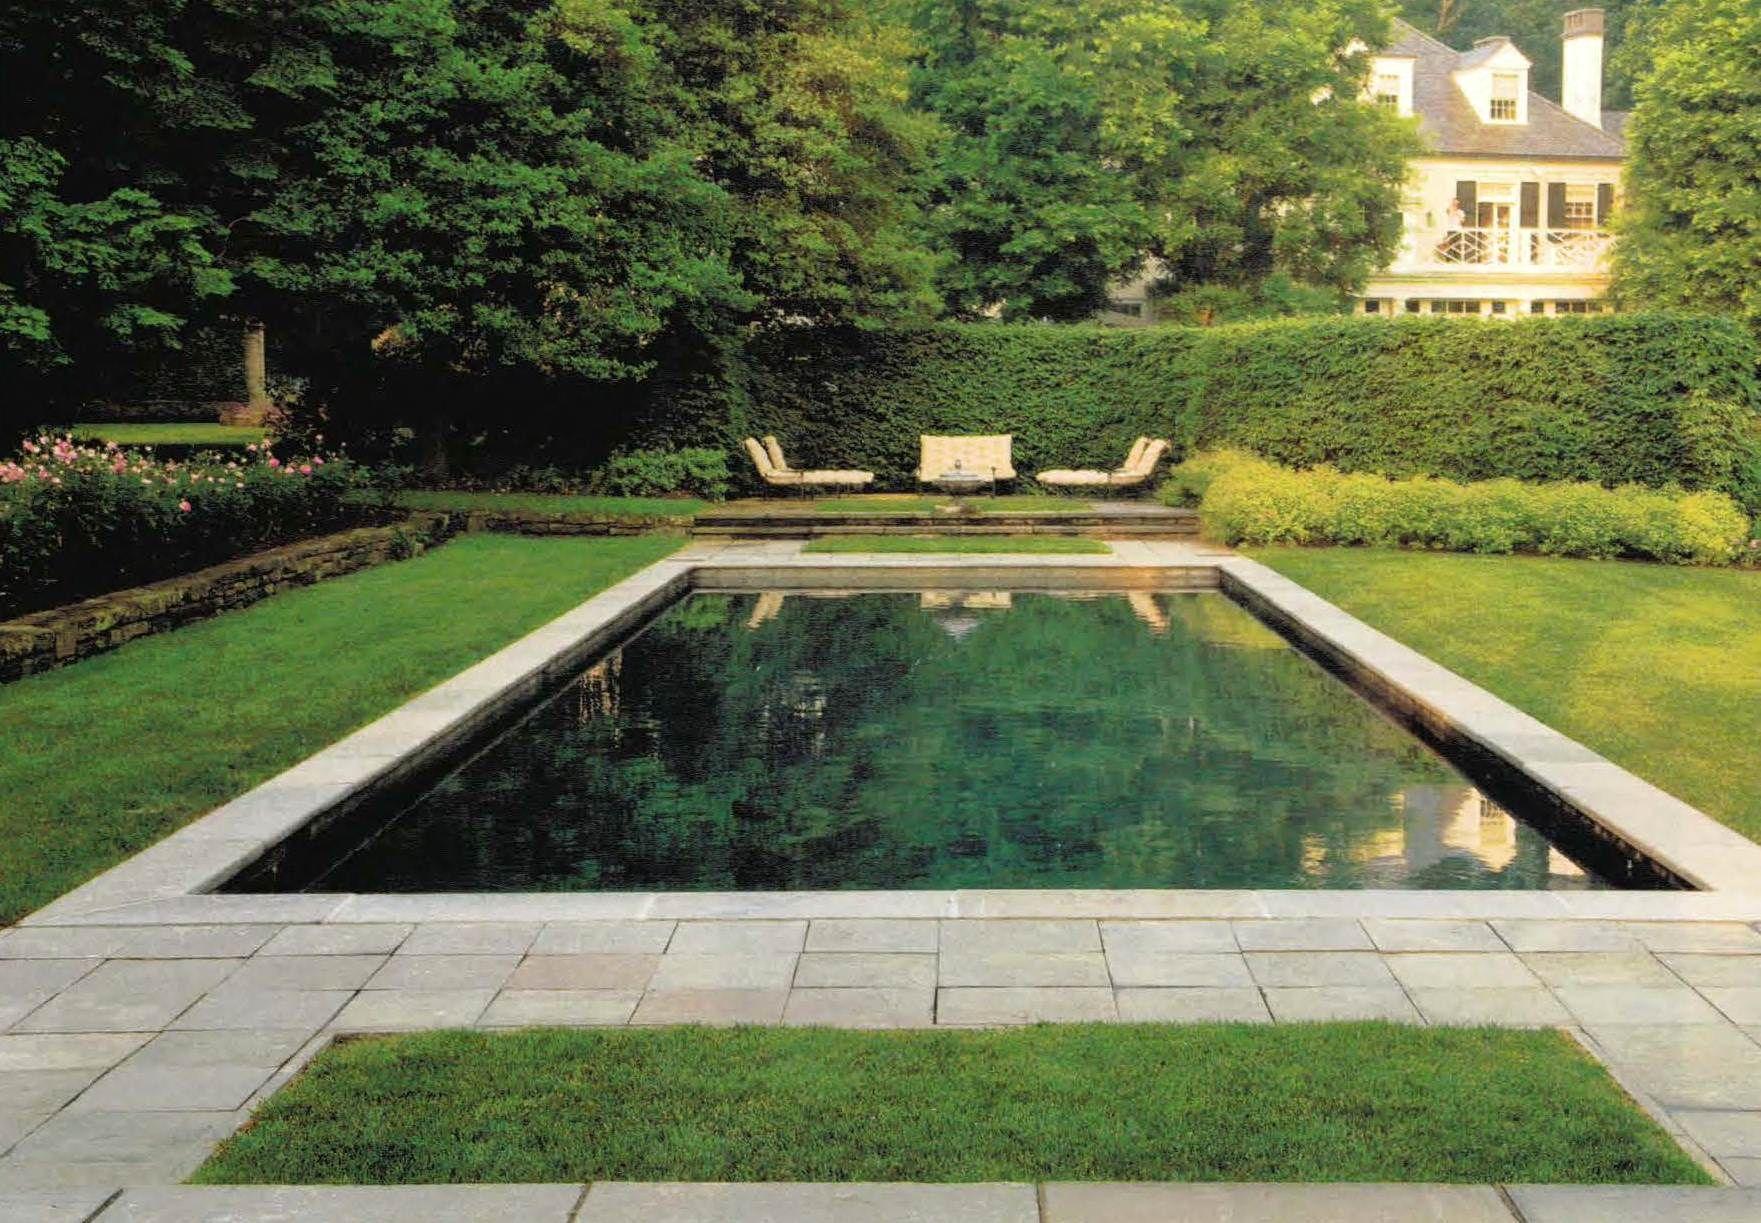 Garden geometry around a rectangular pool